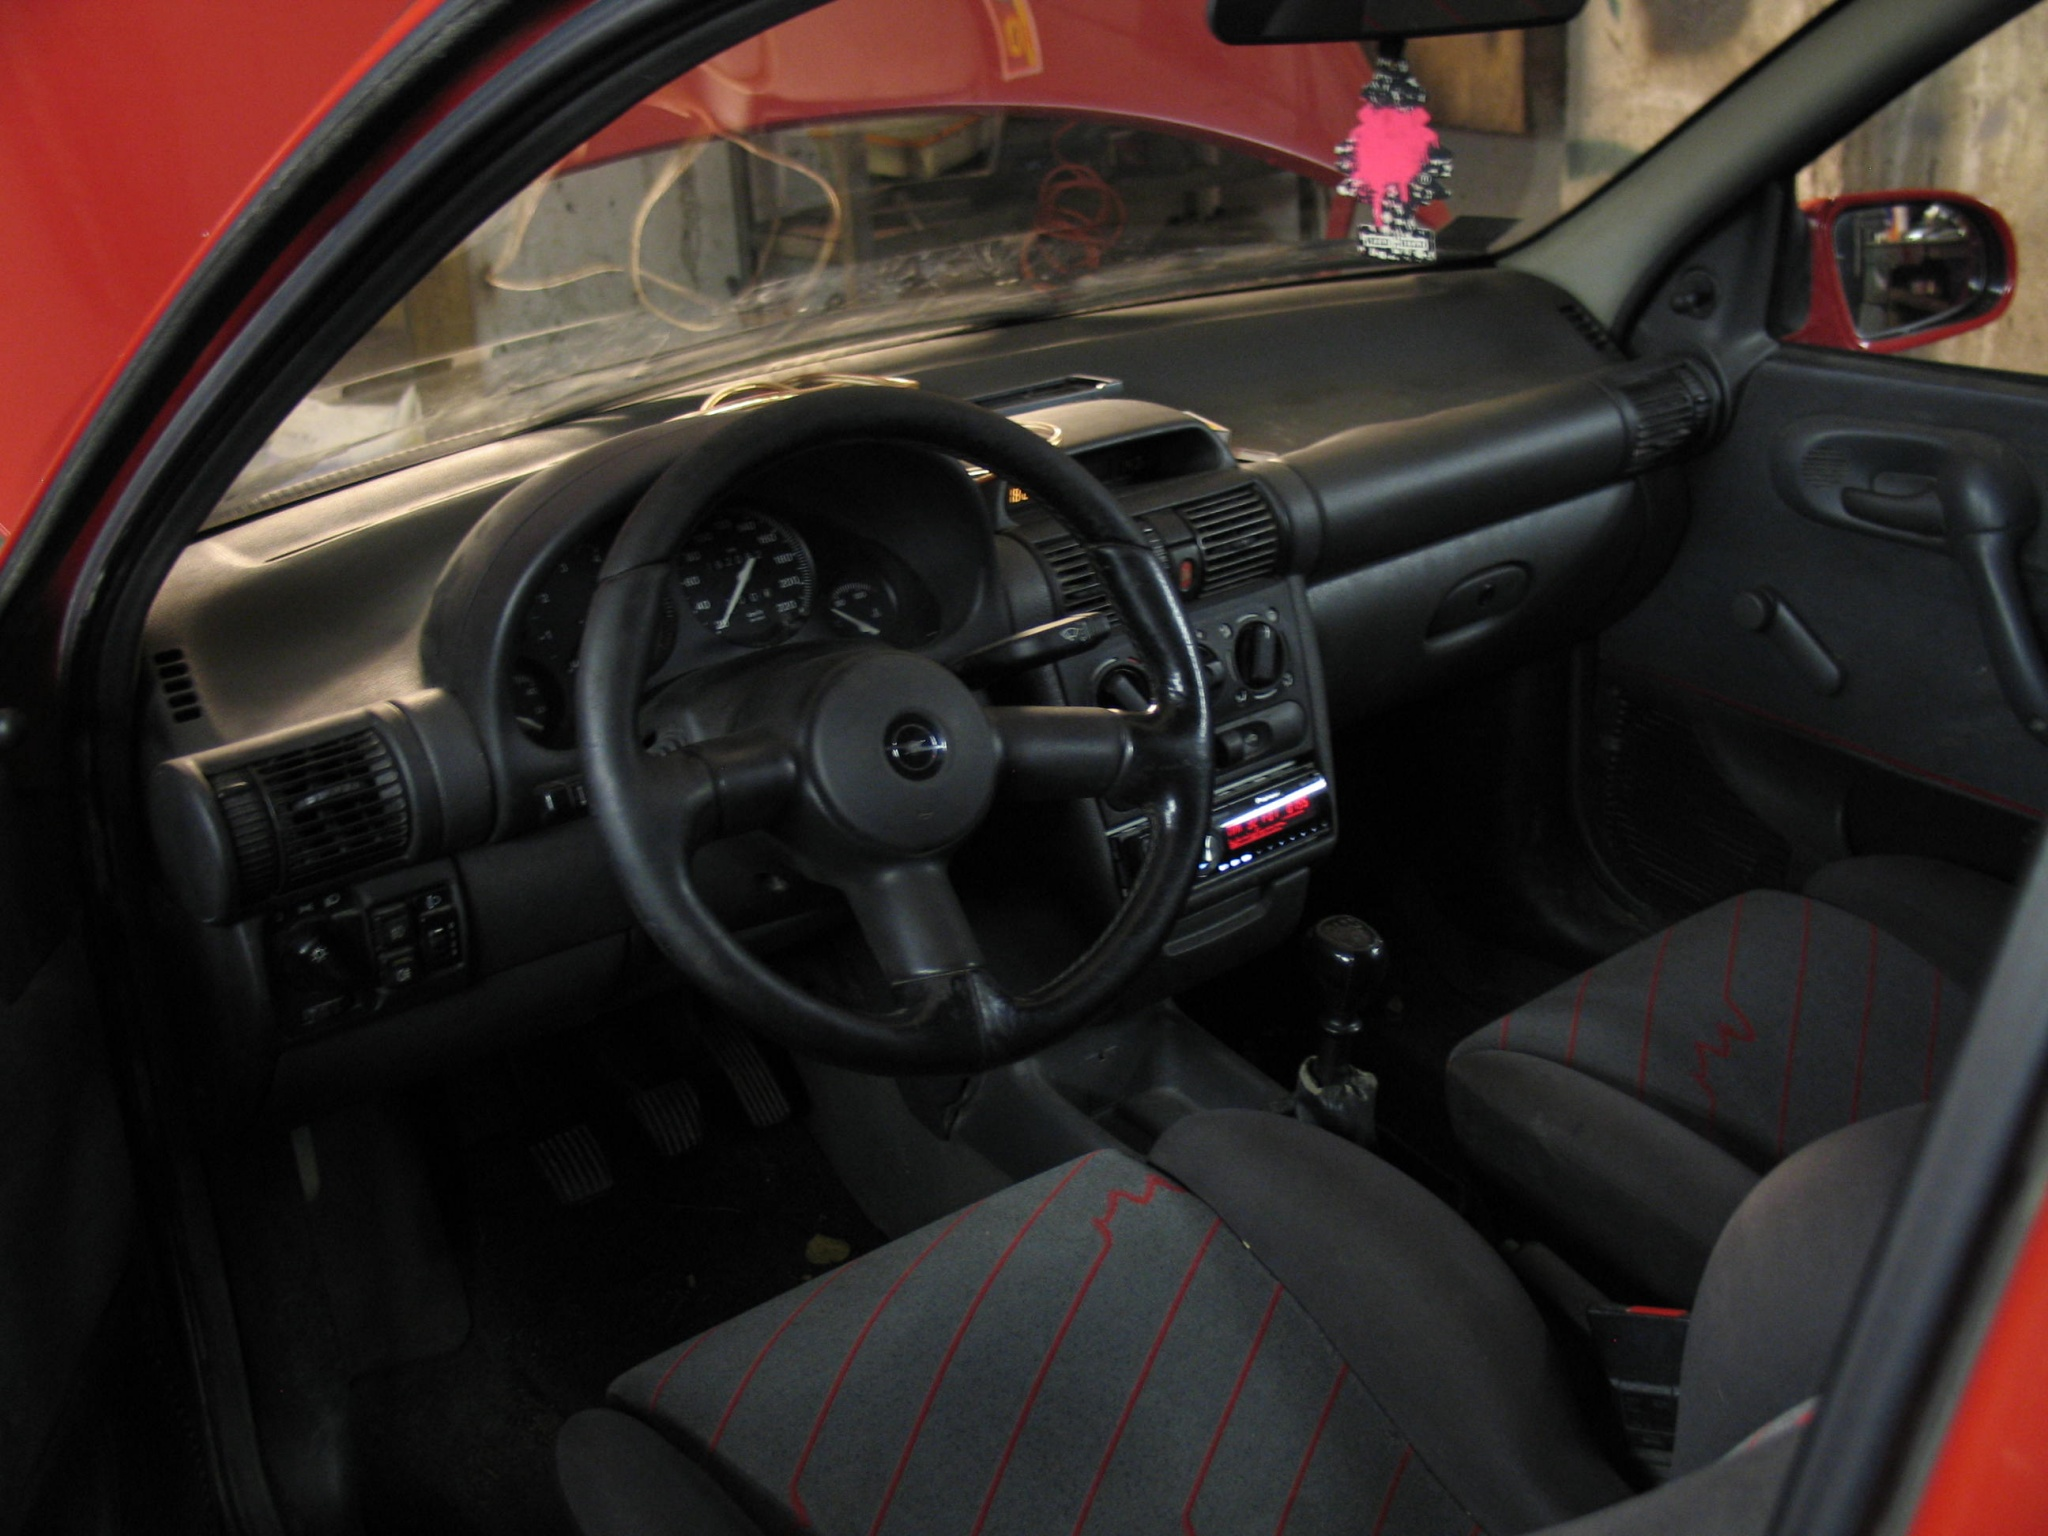 Fotos de los interiores de tu coche vol 1 forocoches for Opel corsa 2010 interior